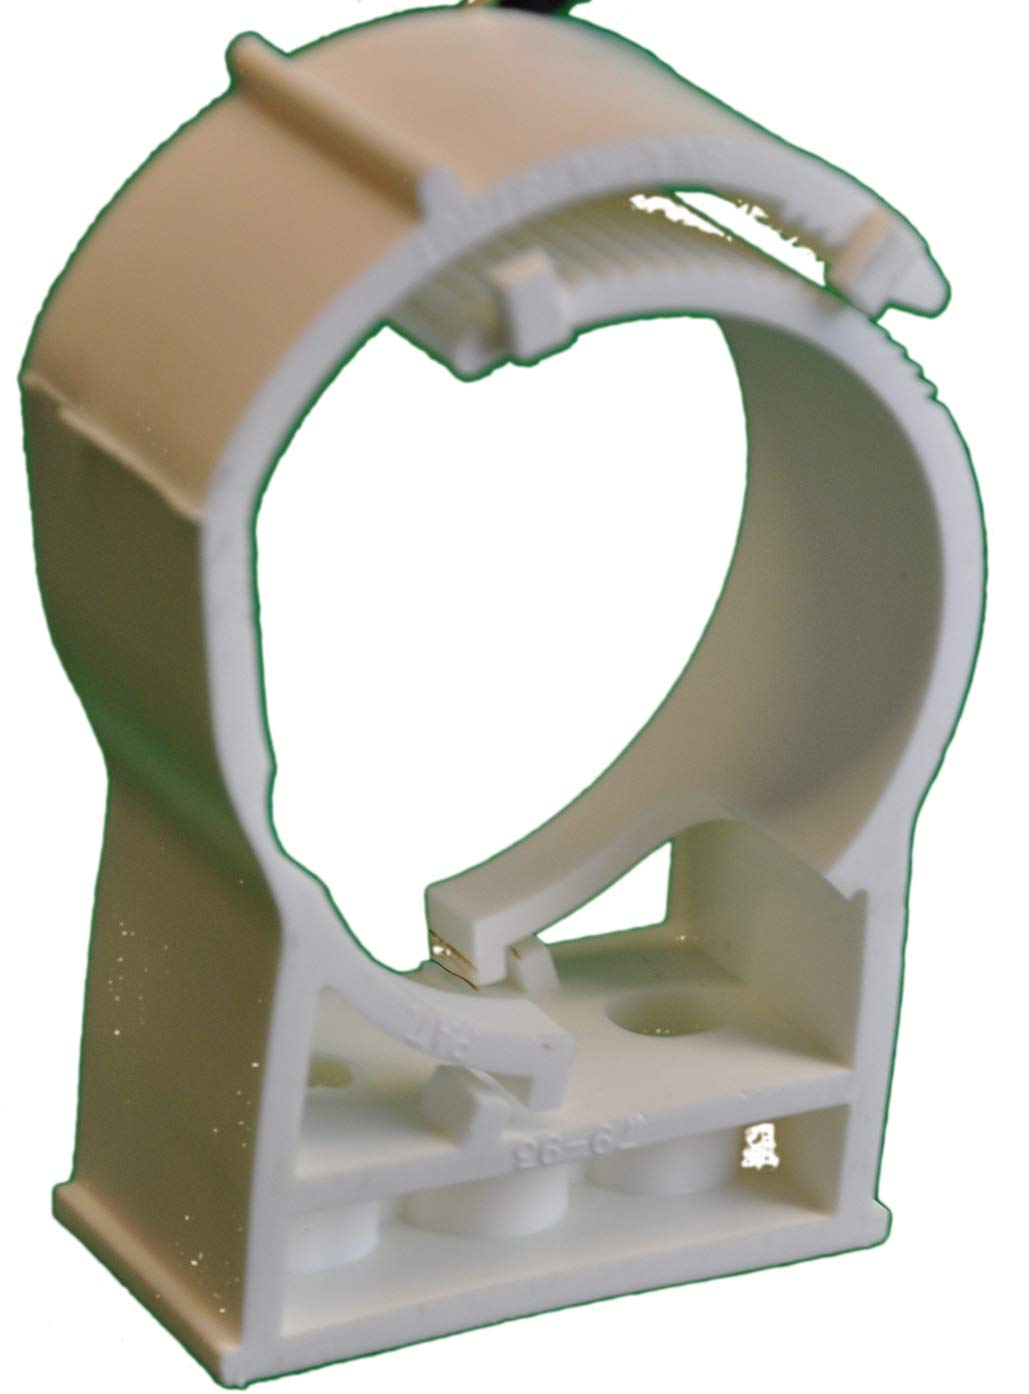 Snapnstrut HS white PP for 3 inch PVC pipe Snap N Strut SNS 79-93HS